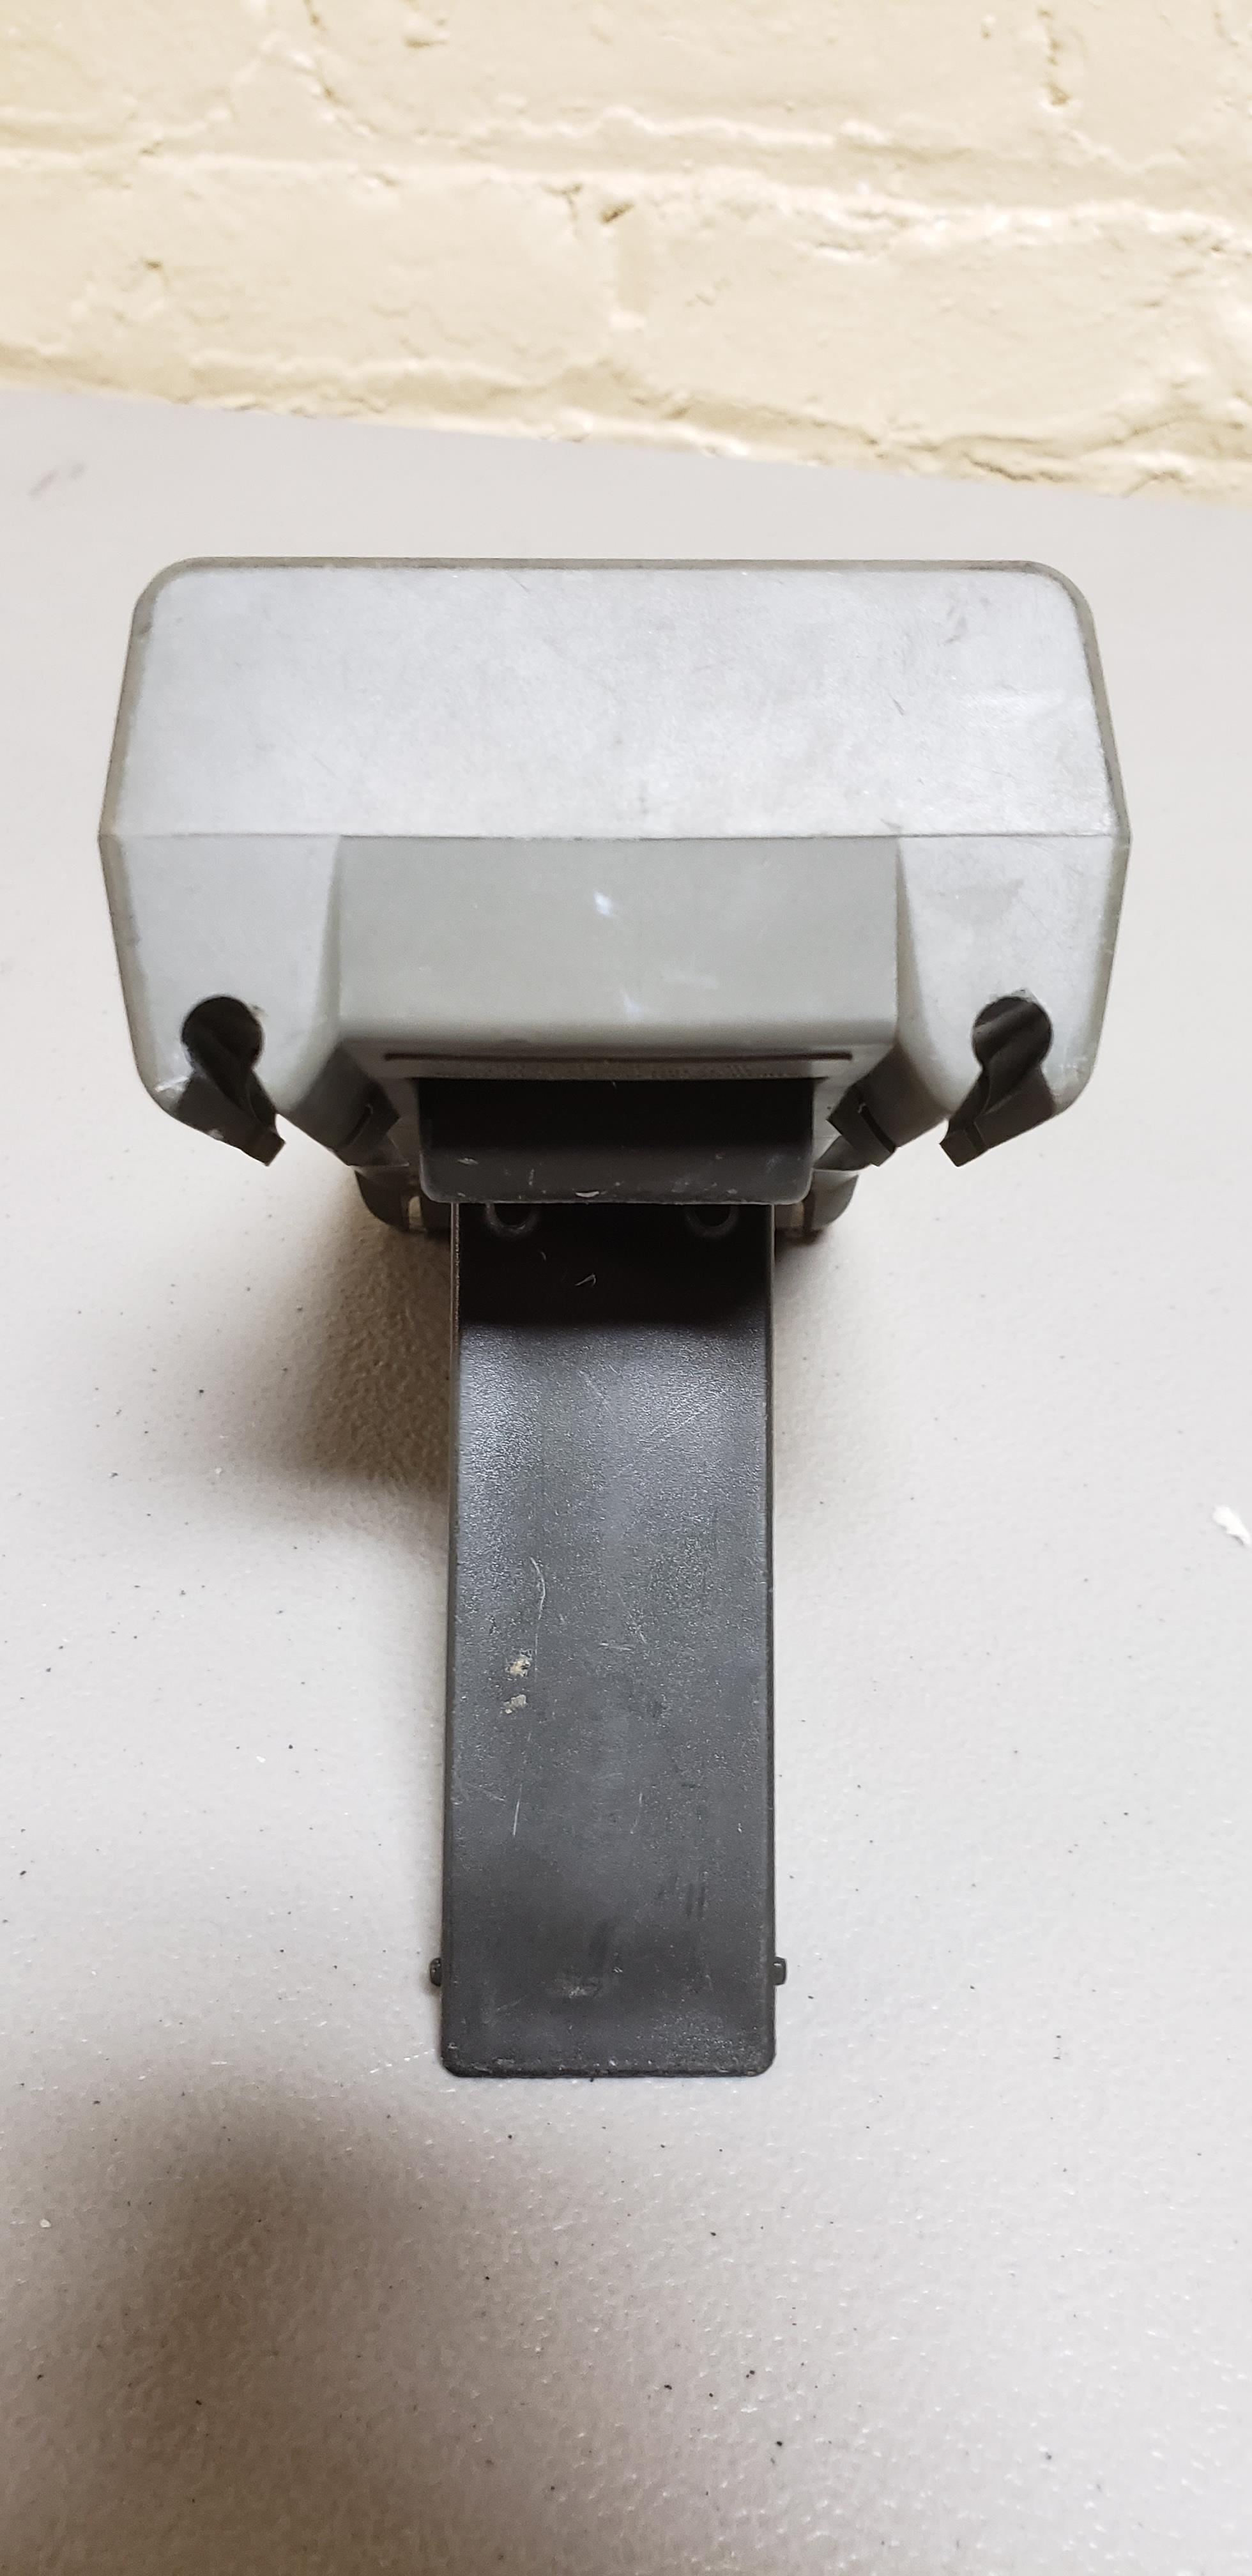 Lot 50 - Fluke 51 K/J Digital Thermometer